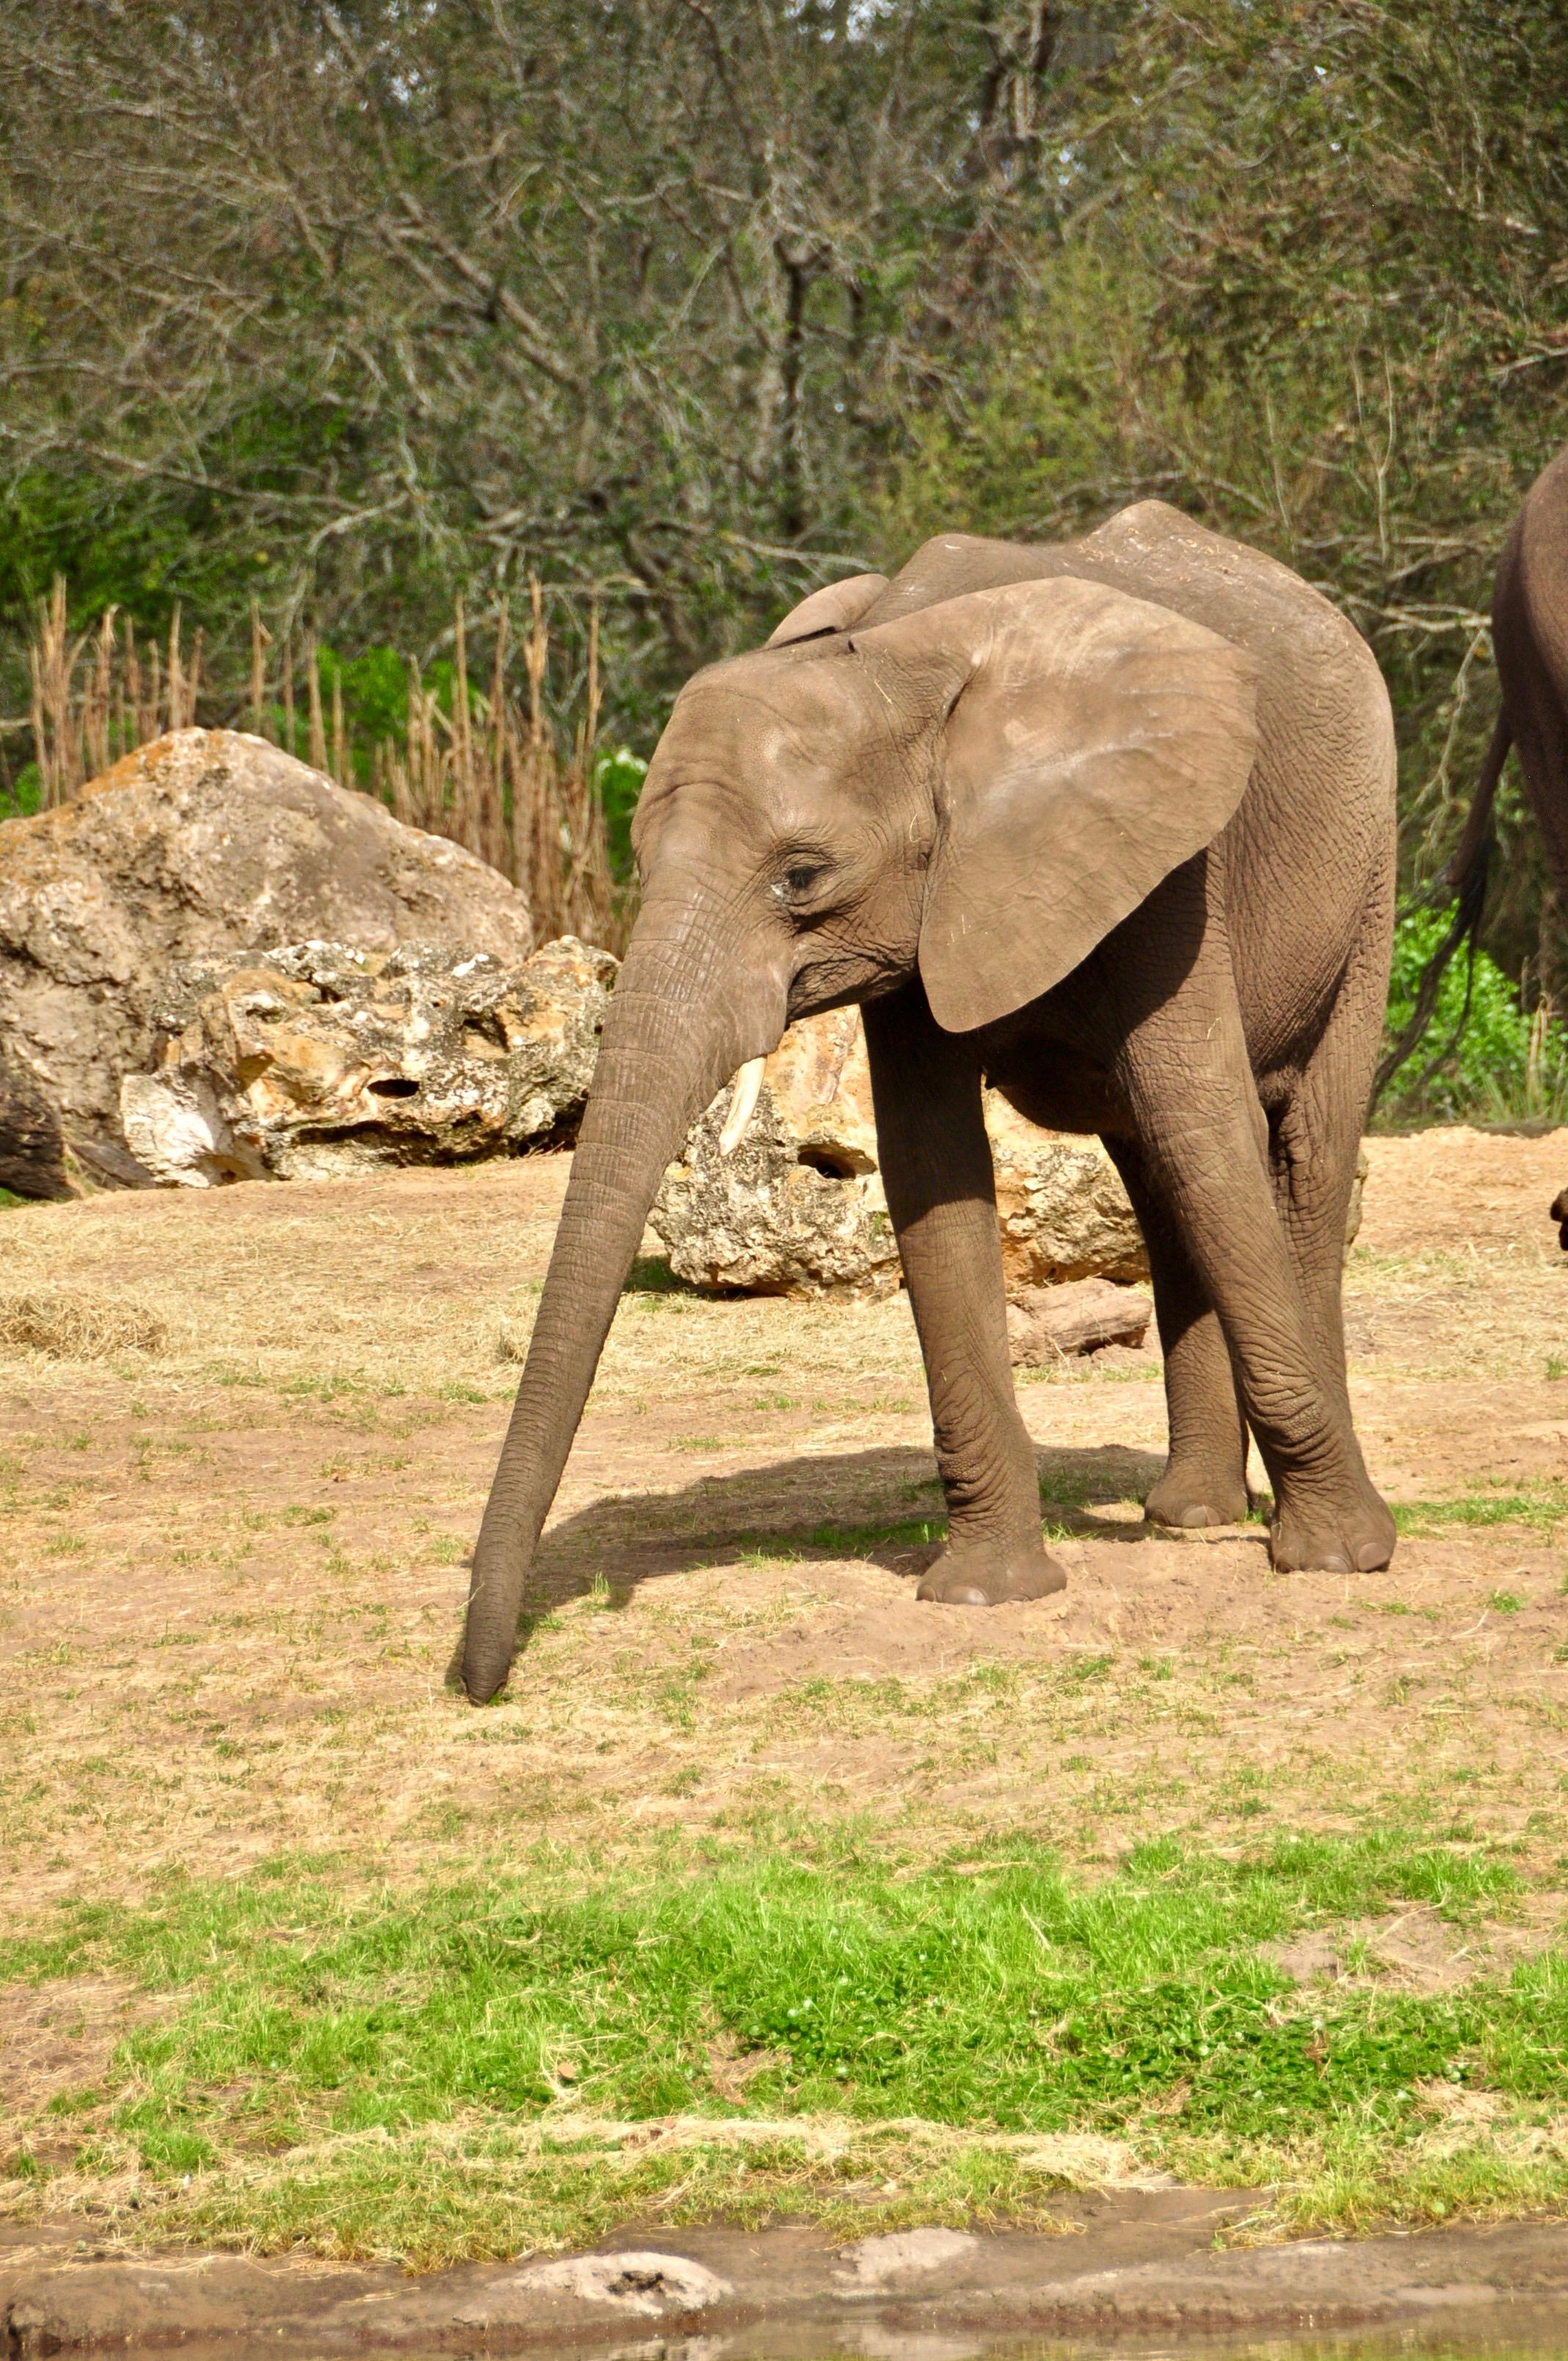 Disney's Wild Africa Trek - A Happy Passport #disneyworld #wildafricatrek #disney